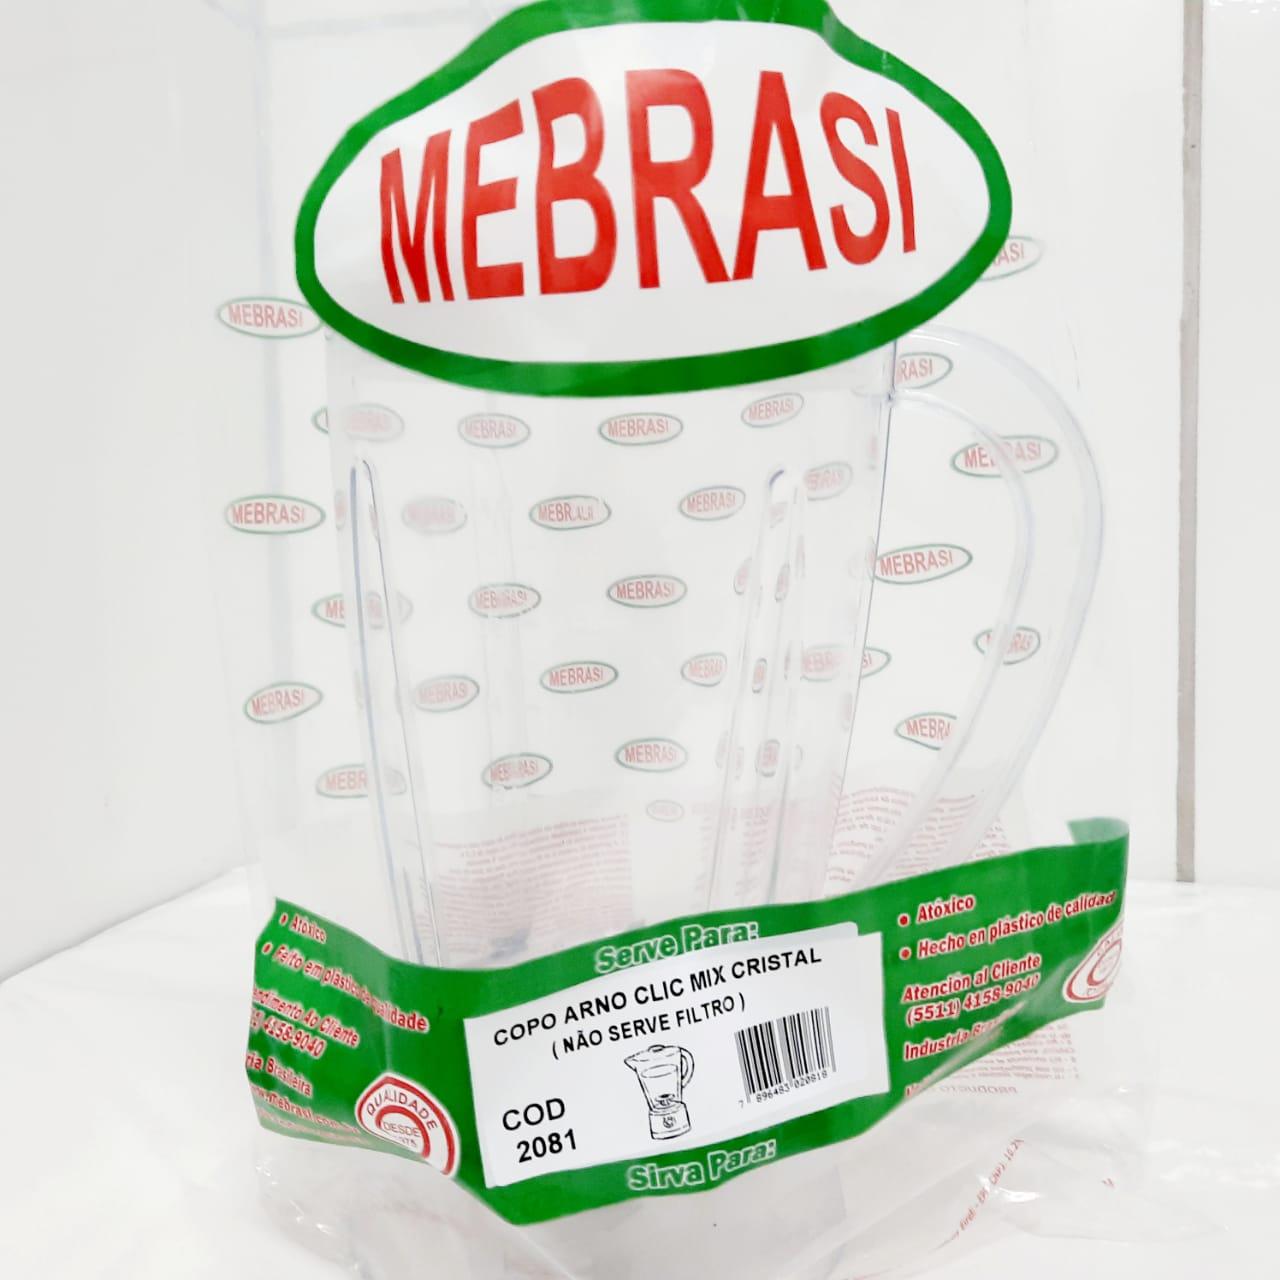 Copo Arno Cristal Clix Mix - Mebrasi